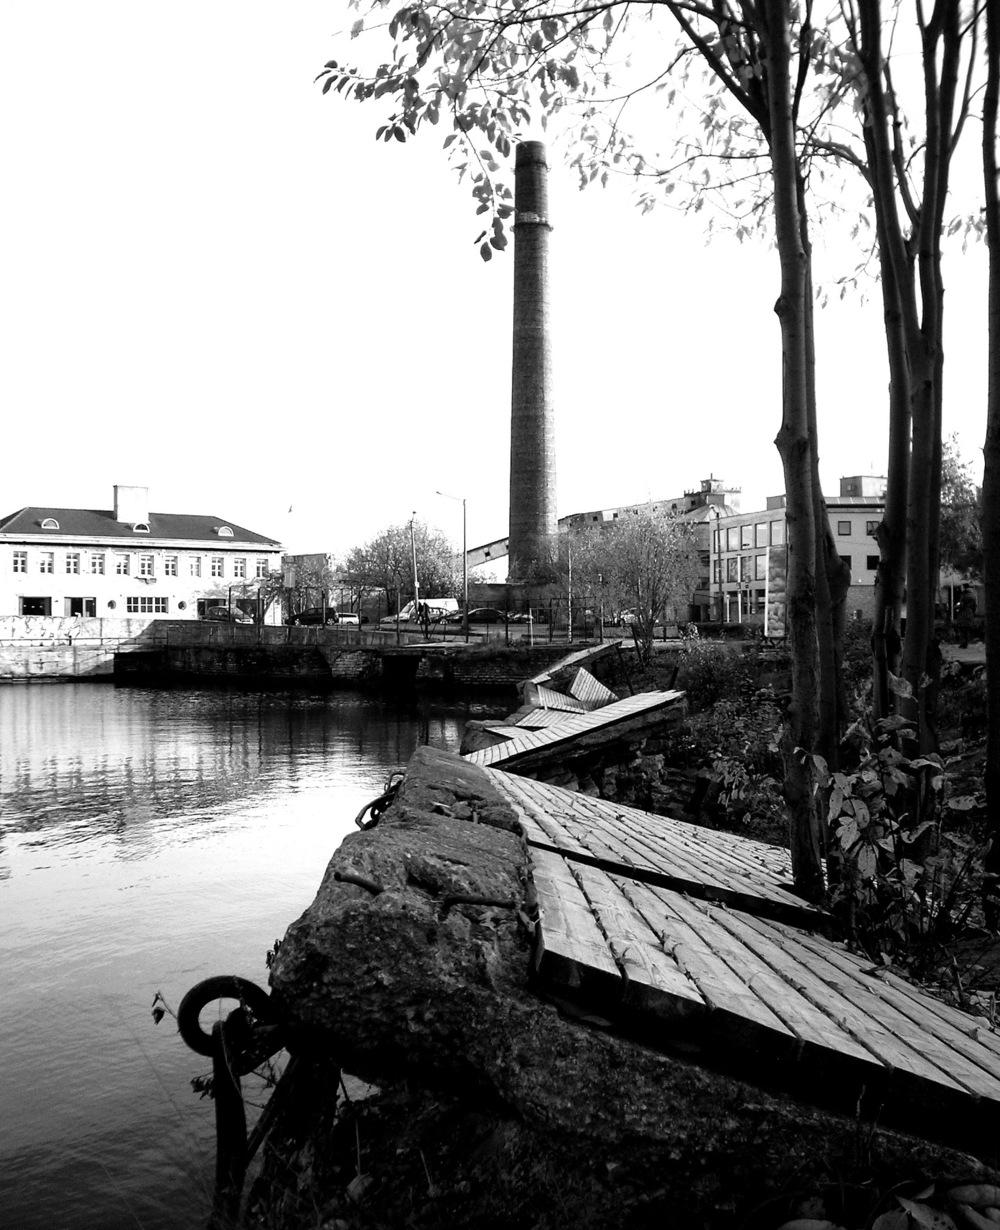 COLOUR-AND-SHAPE Photography - Tallinn, Estonia - 2011